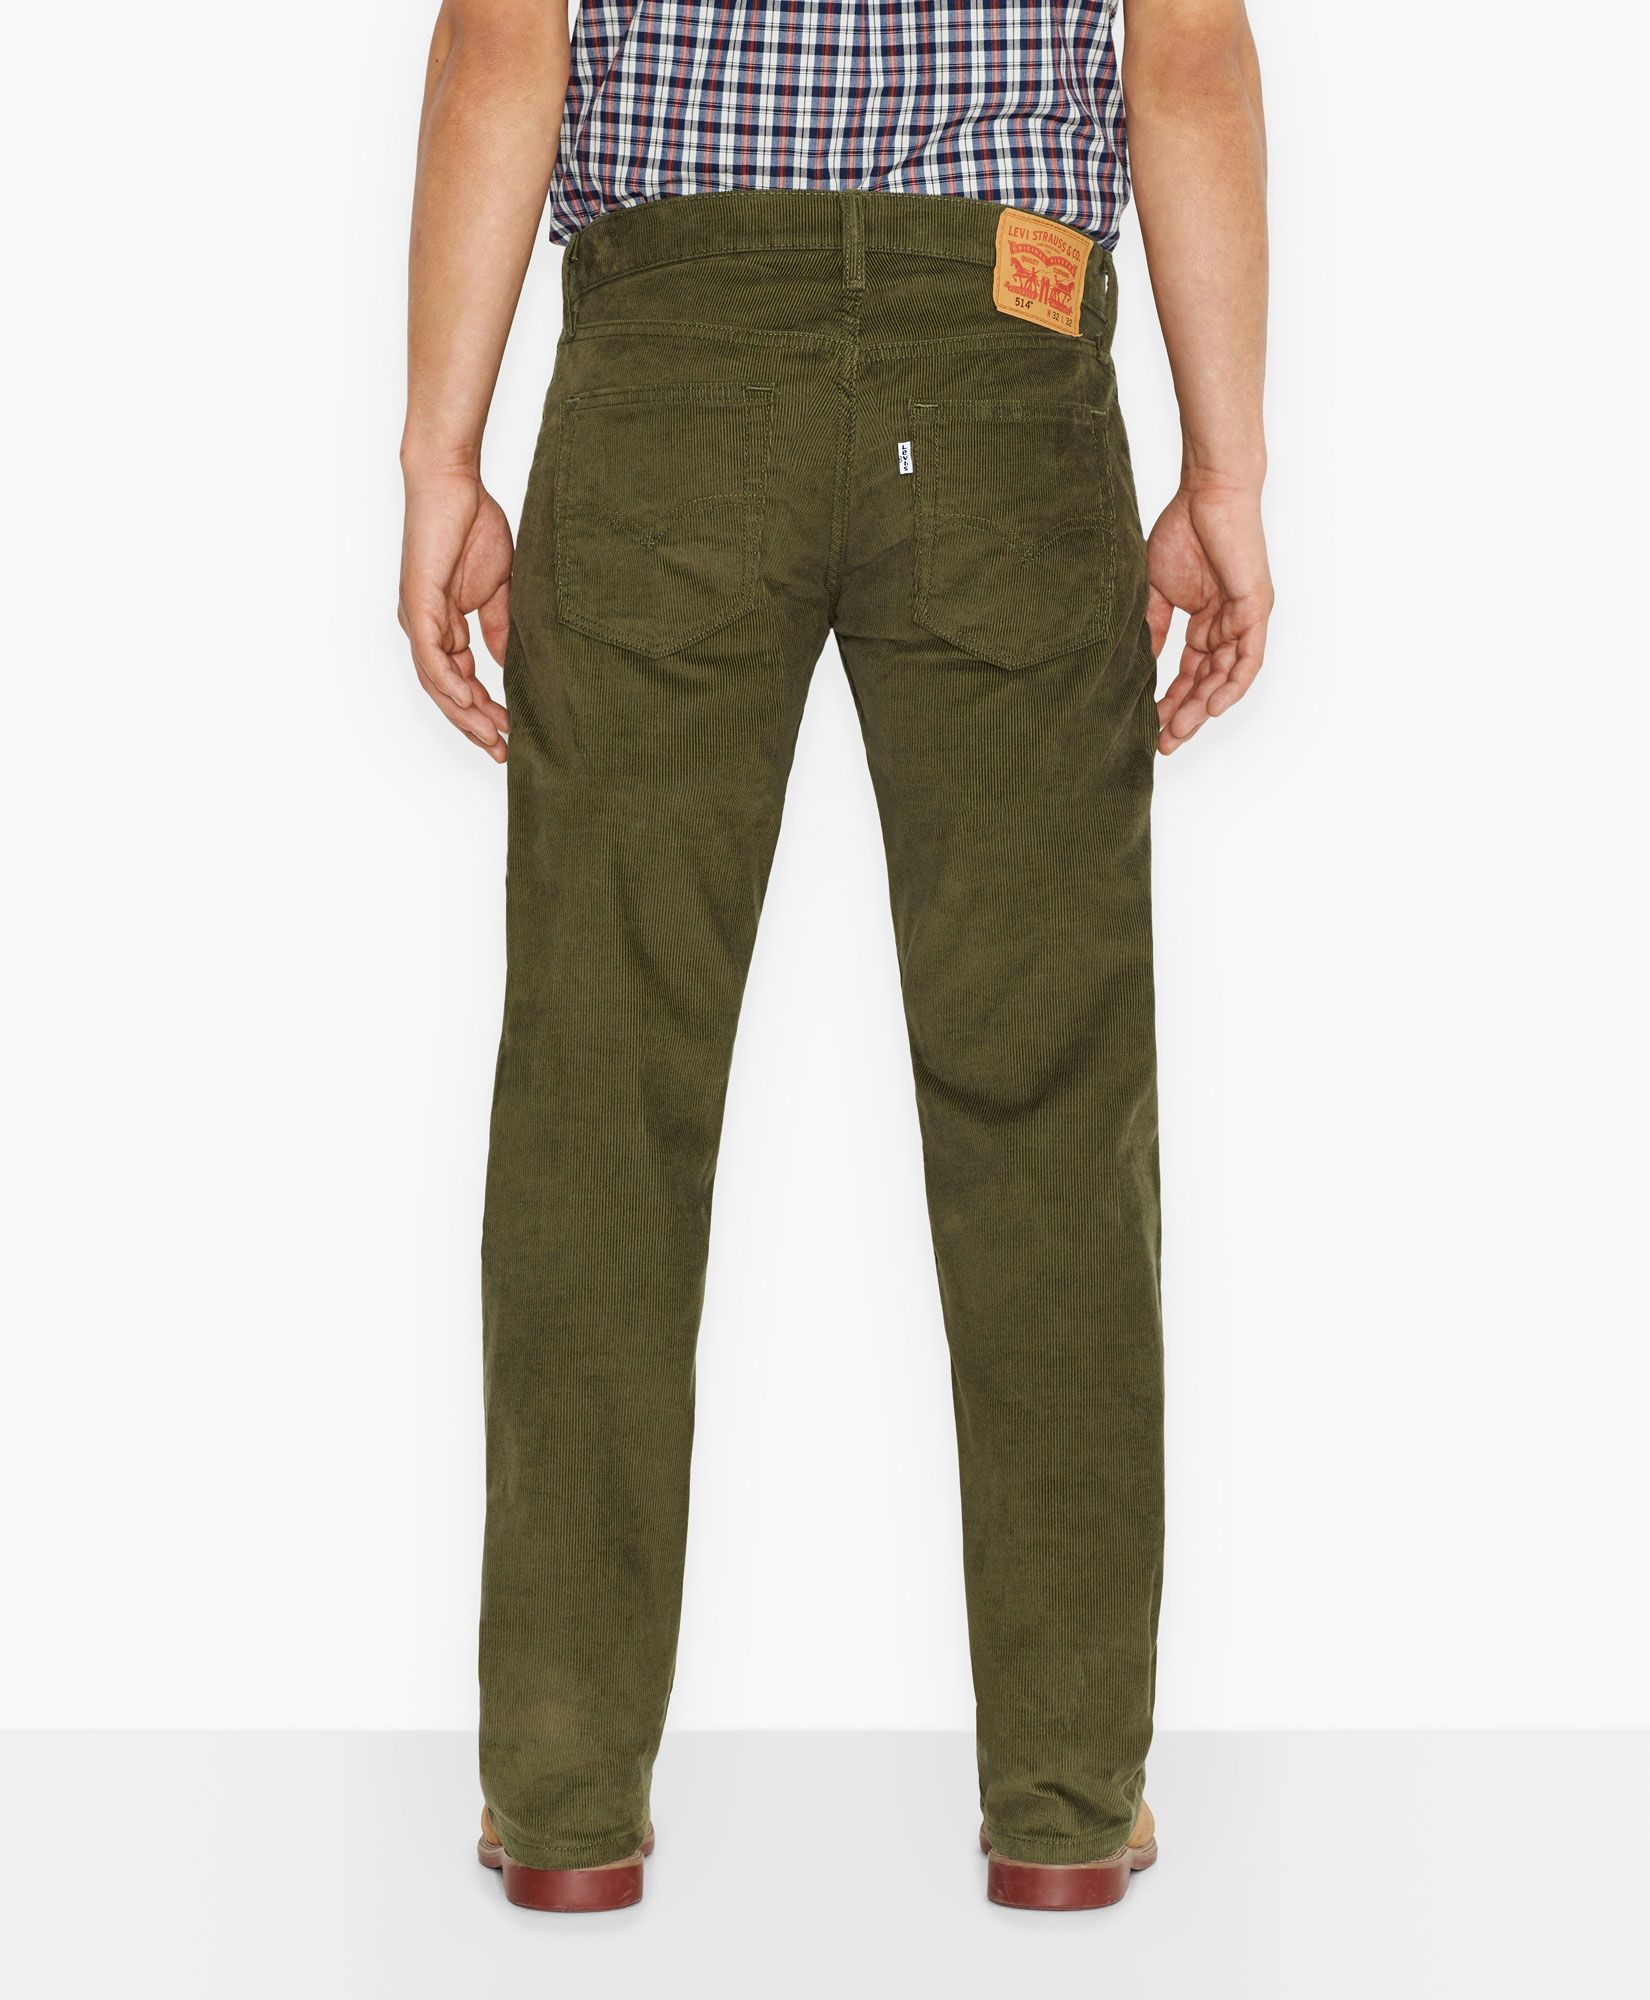 Levi's 514™ Straight Fit Corduroy Pants - Burnt Olive - Jeans | My ...